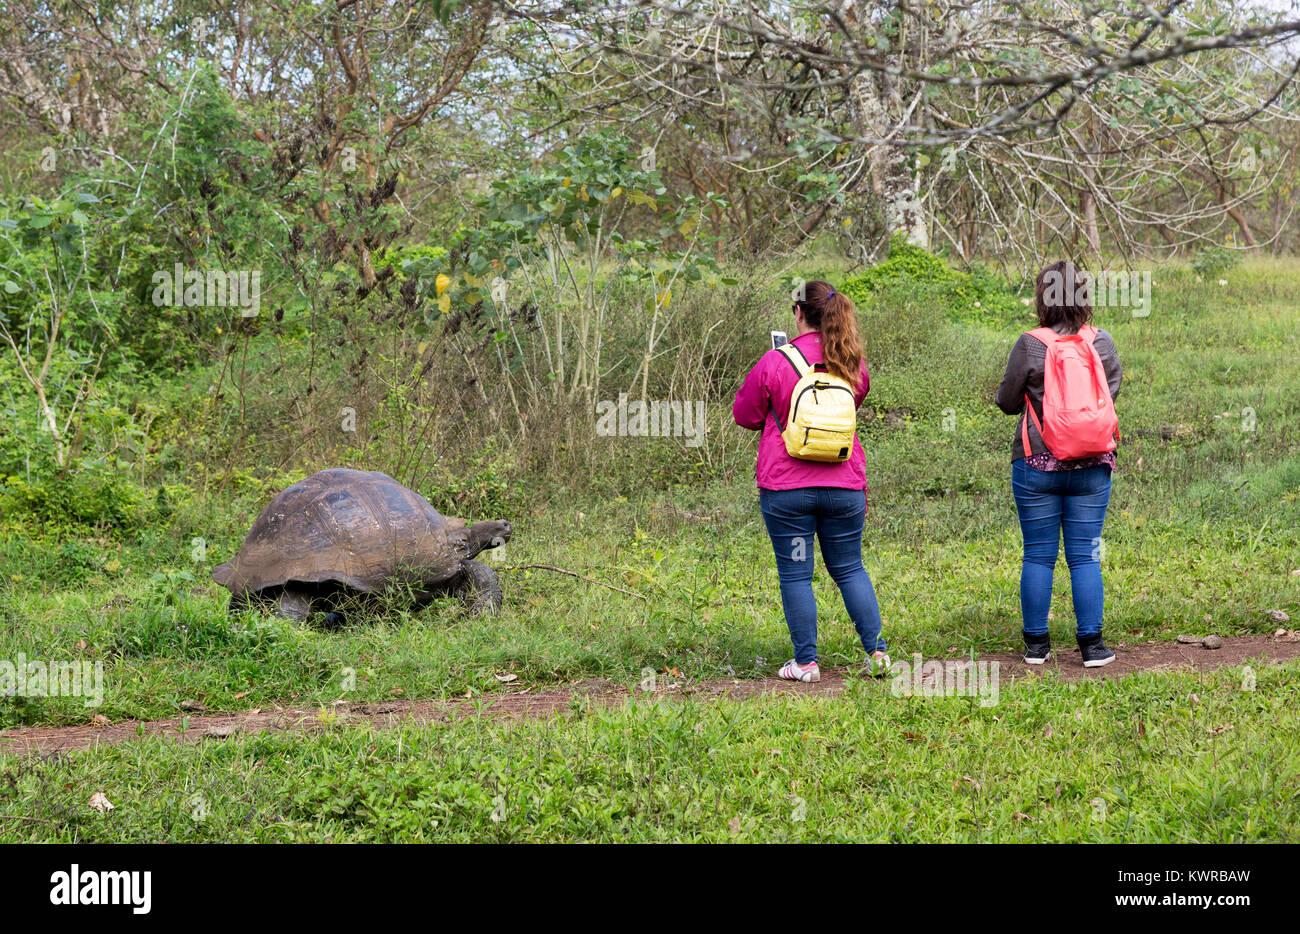 Tourists photographing a Giant tortoise, Santa Cruz, Galapagos Islands, Ecuador South America - Stock Image